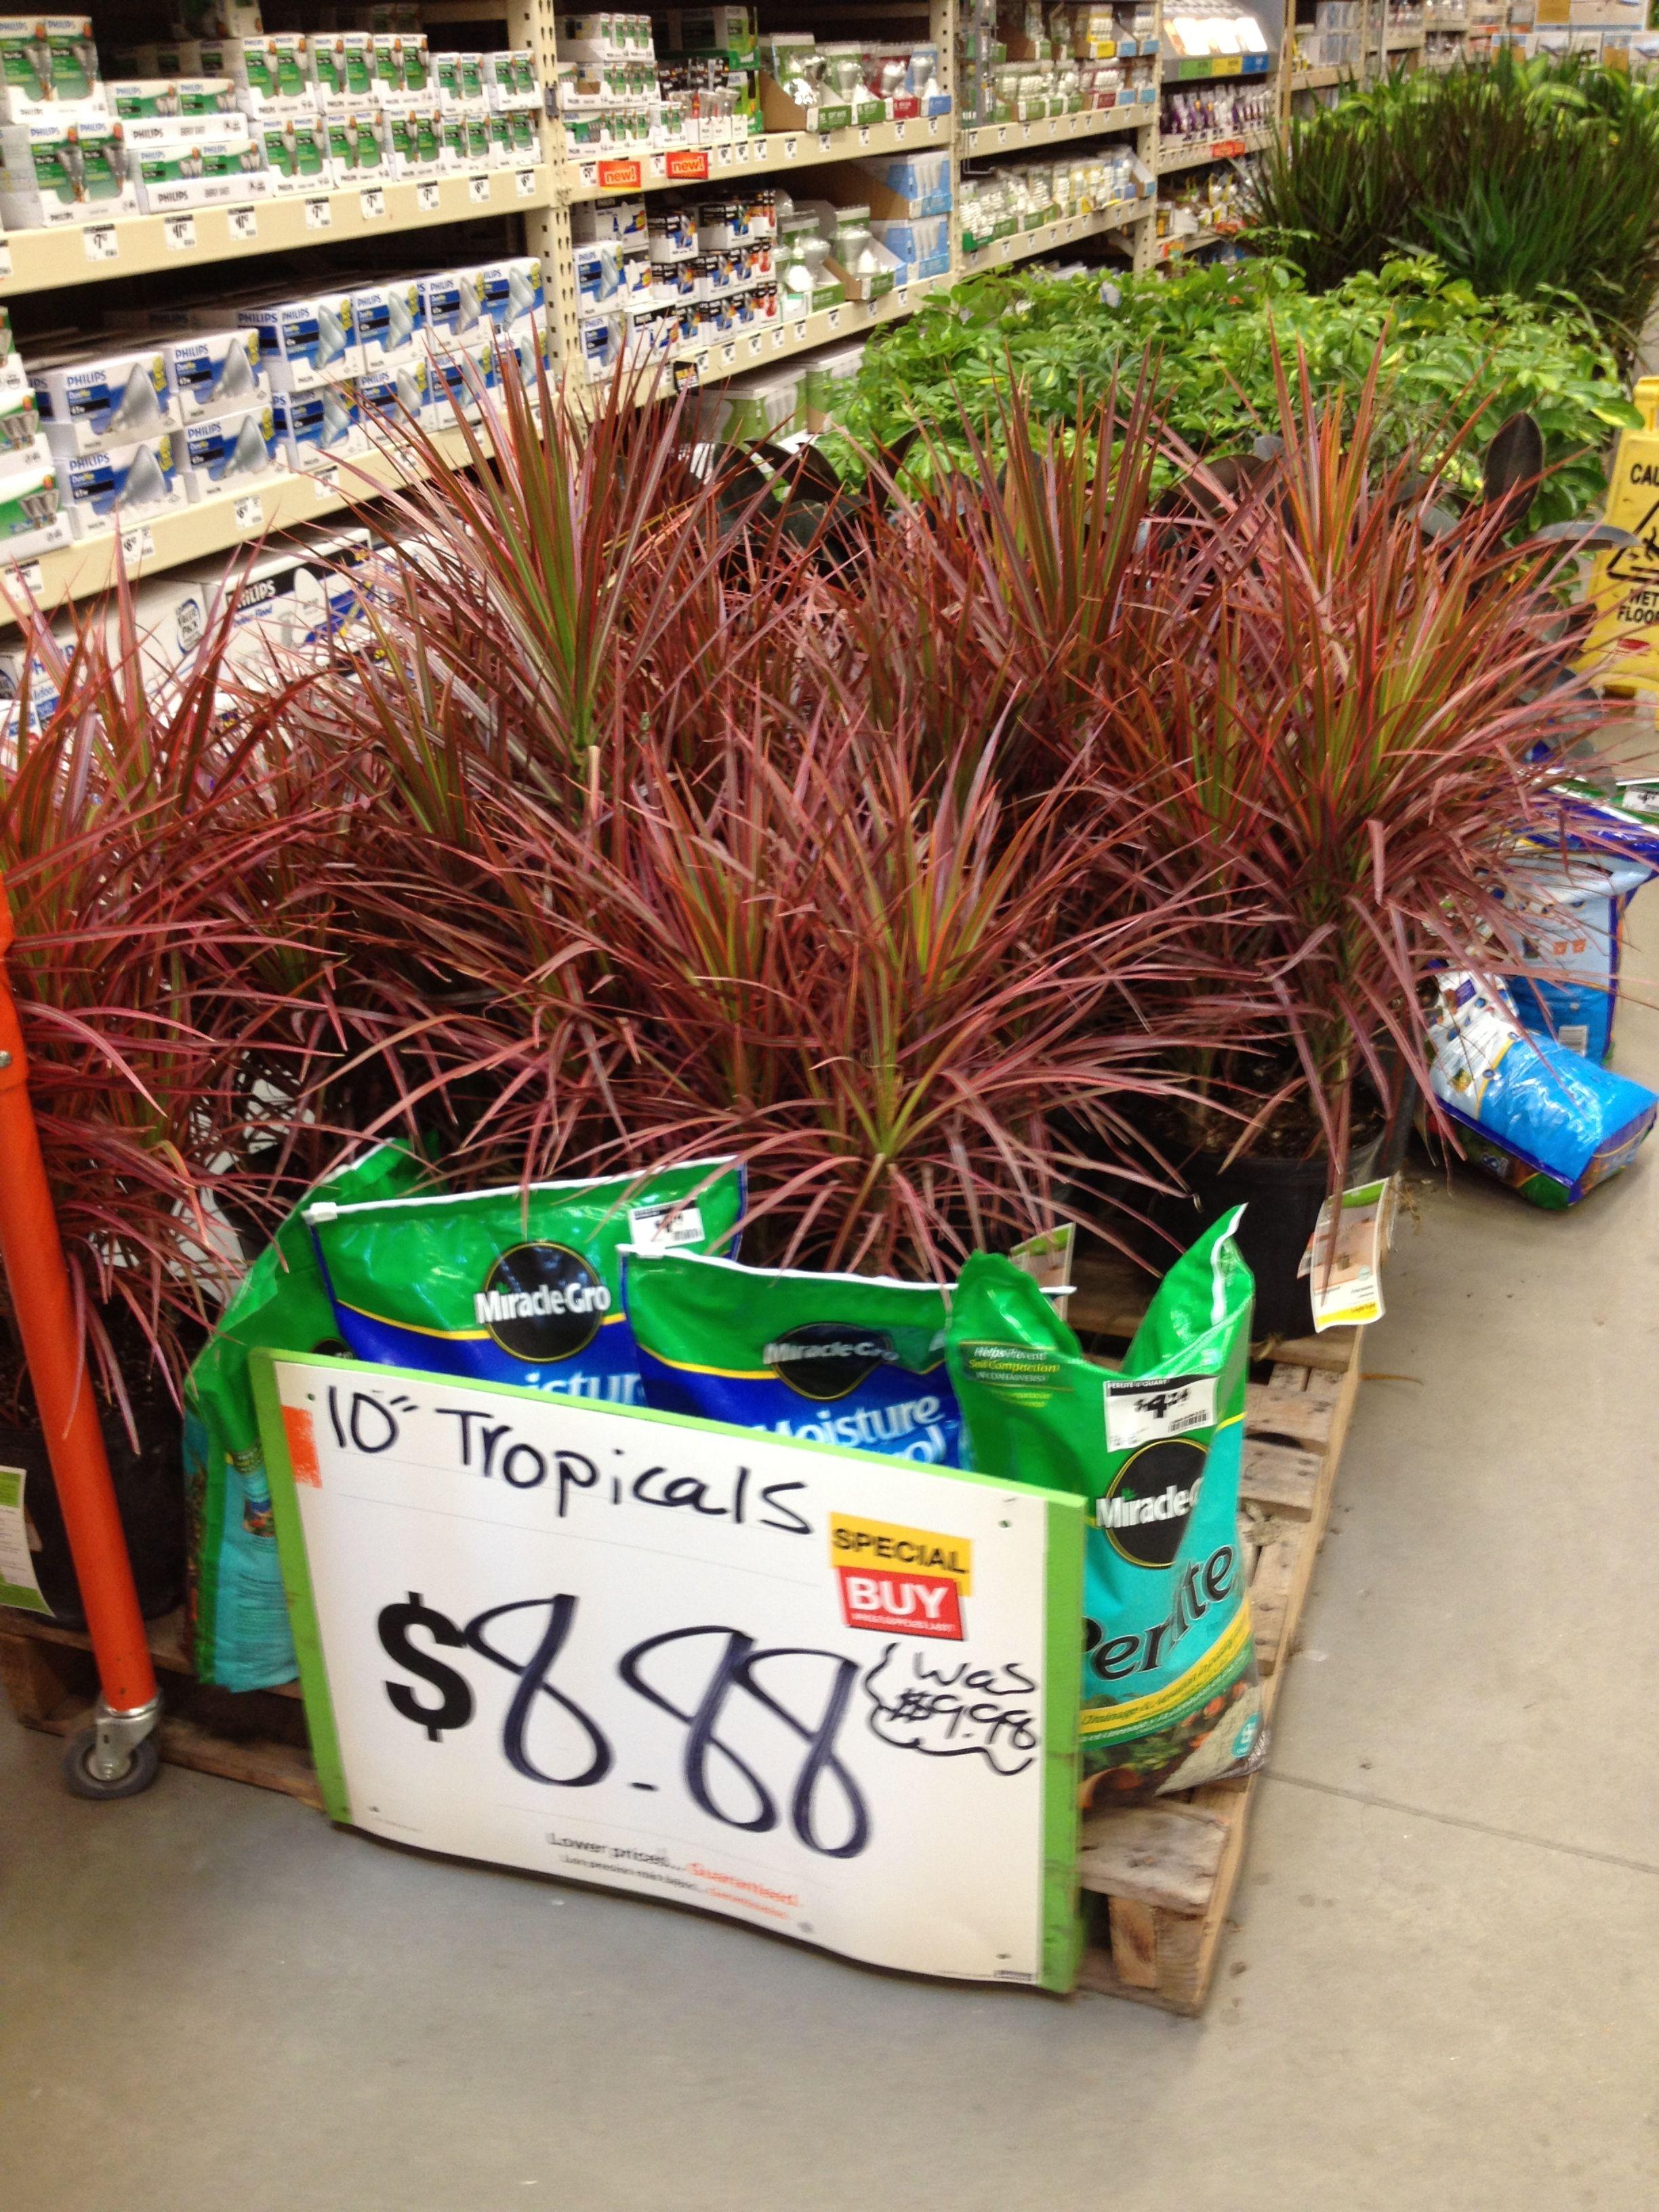 Home Depot plant sale $8 88 for big pretty house plants Do it